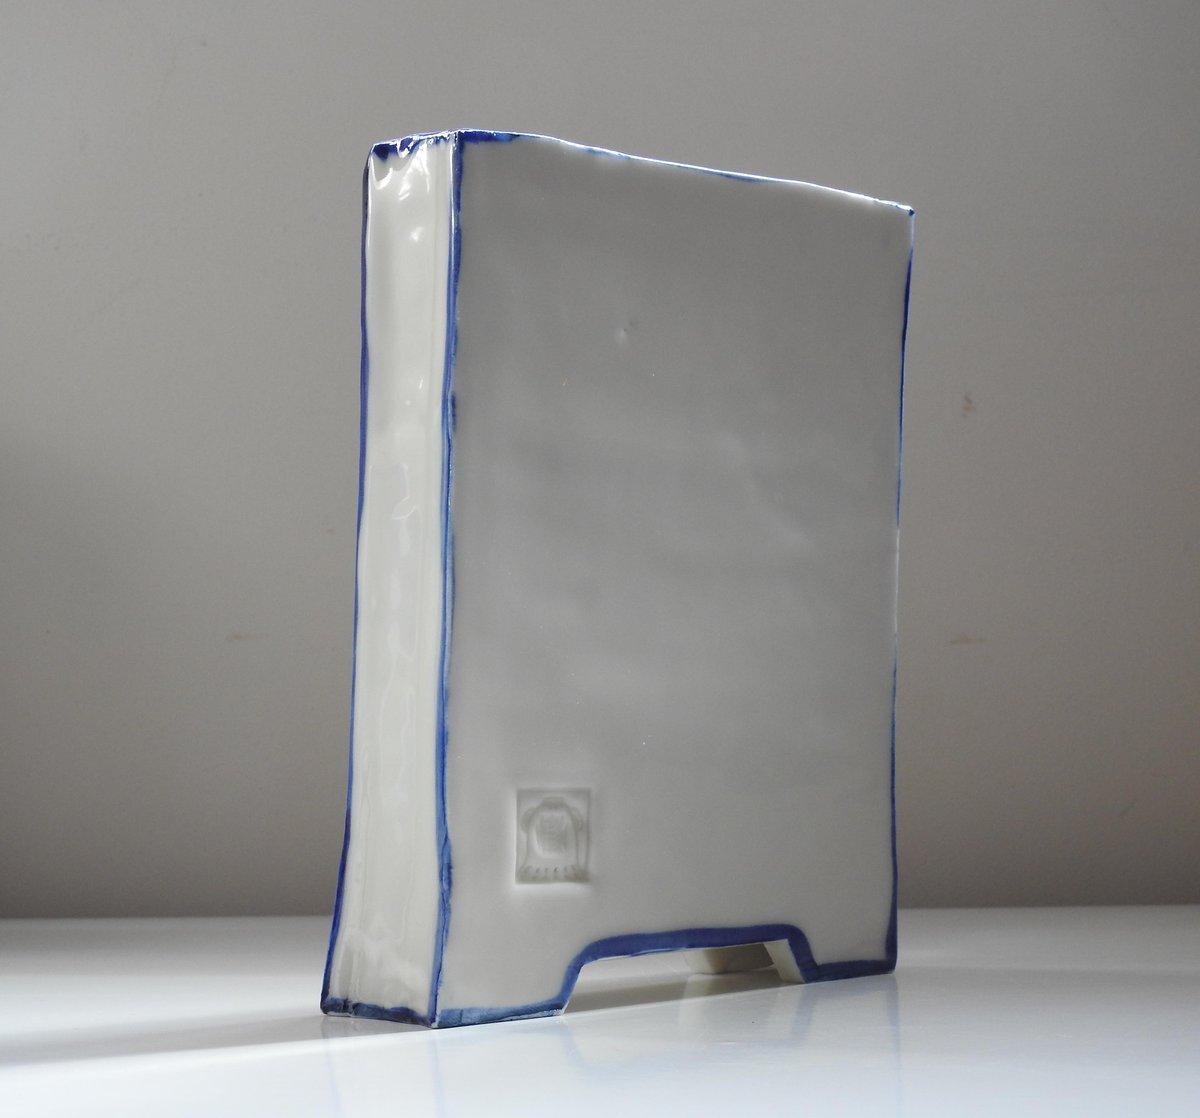 Image of 'Play' Vending Machine - Blue & White